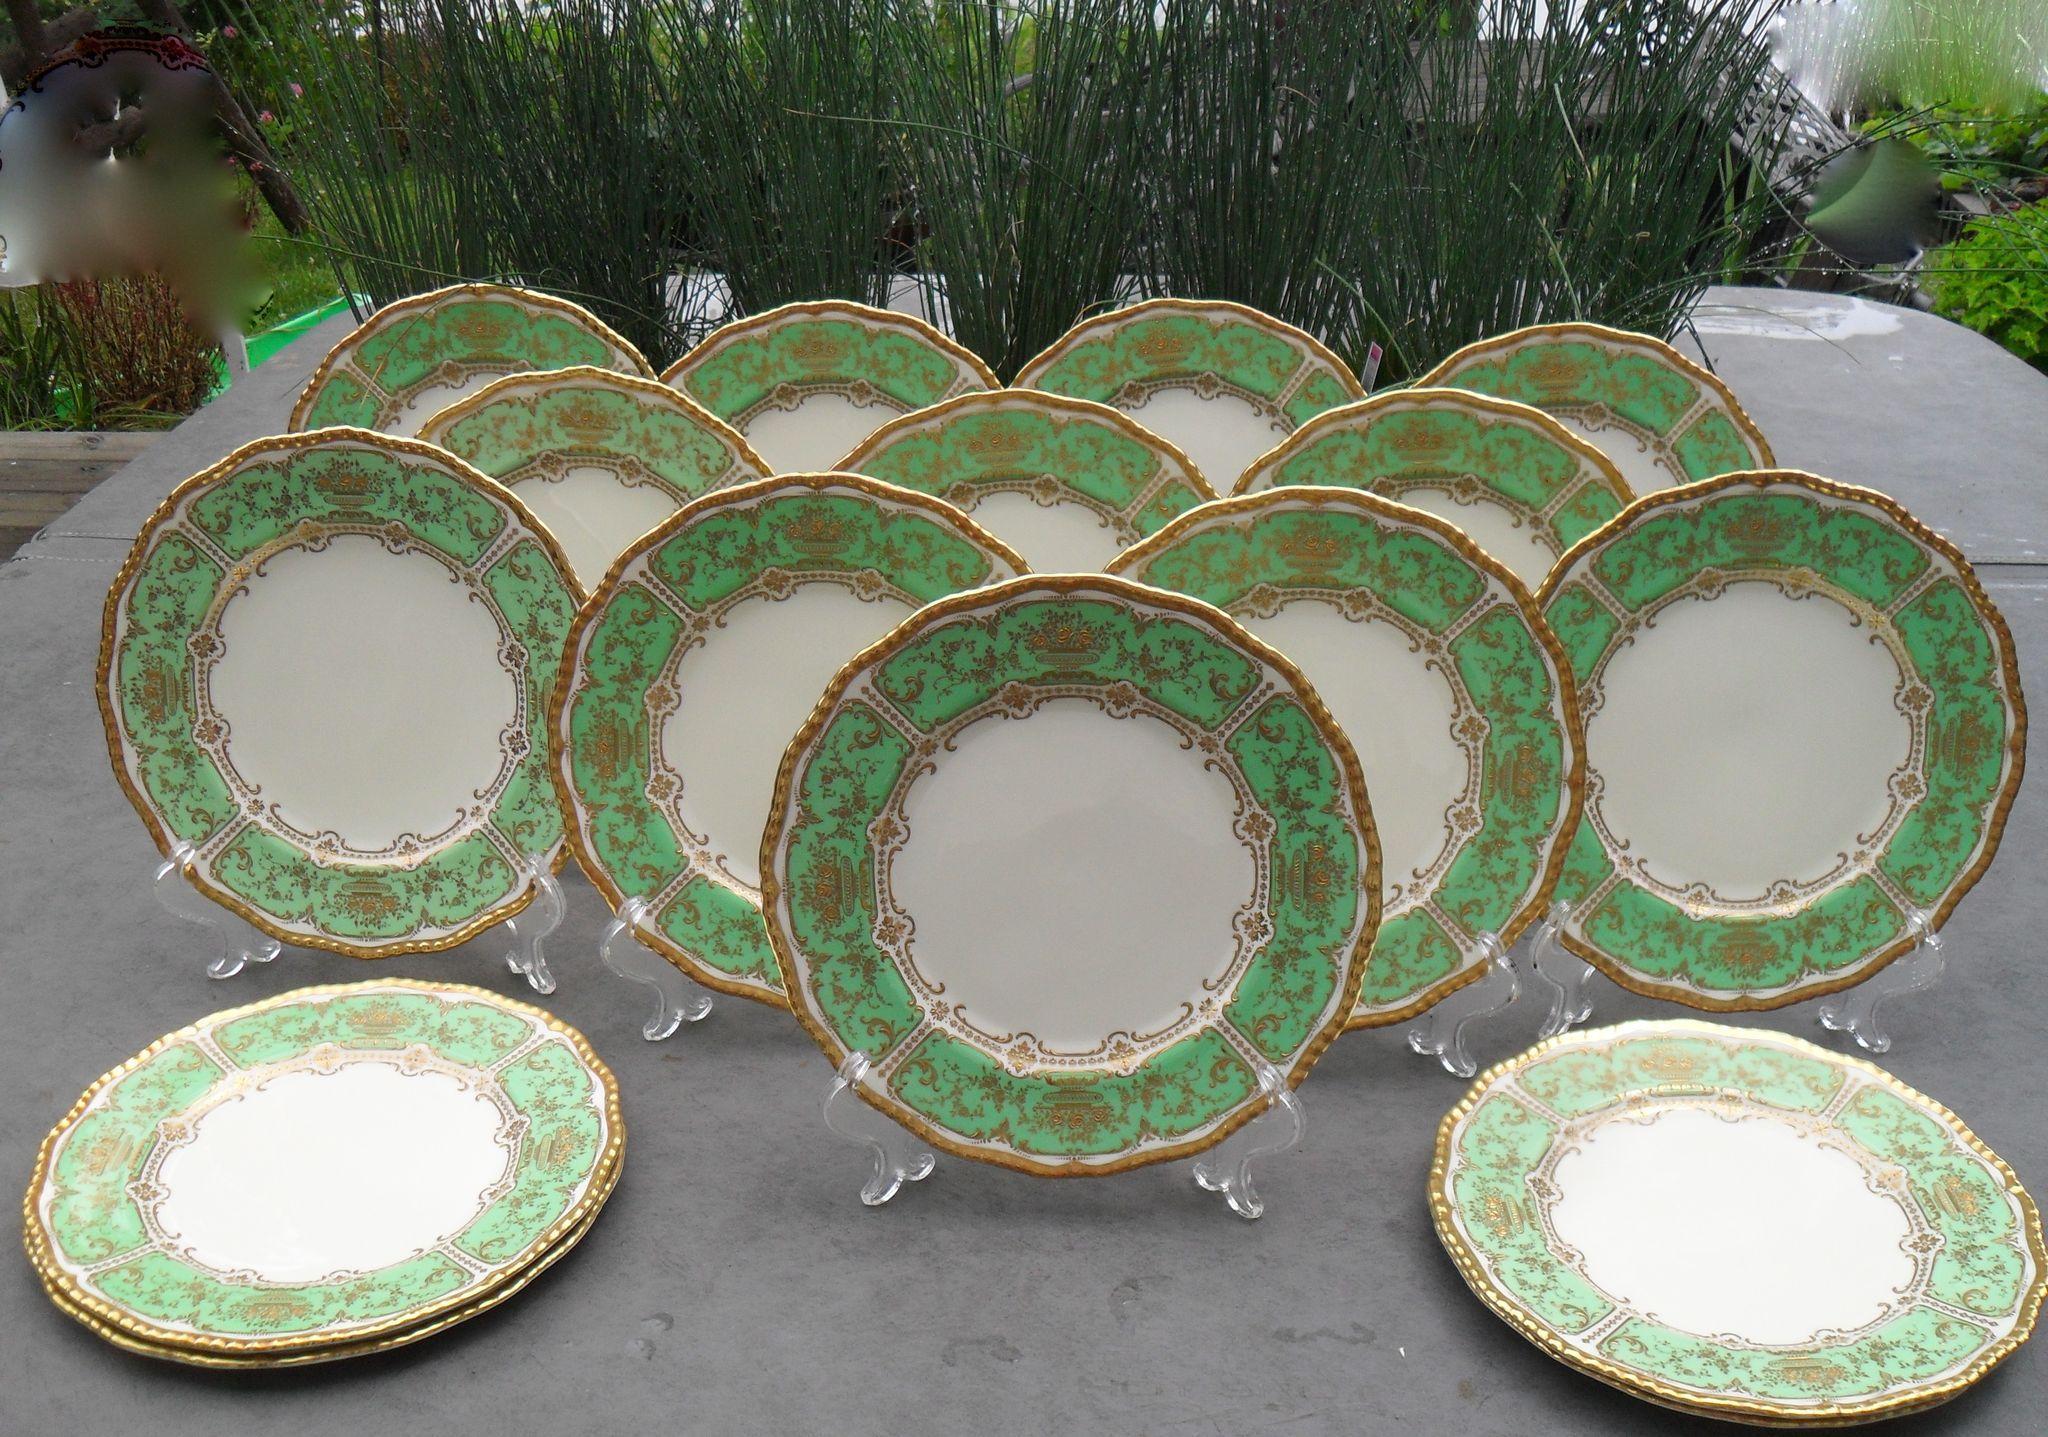 great royal doulton set of gold encrusted spring green dinner plates misssmithvt ruby lane with royal doulton dinner plates & Royal Doulton Dinner Plates. Beautiful Royal Doulton Dinner Plate ...